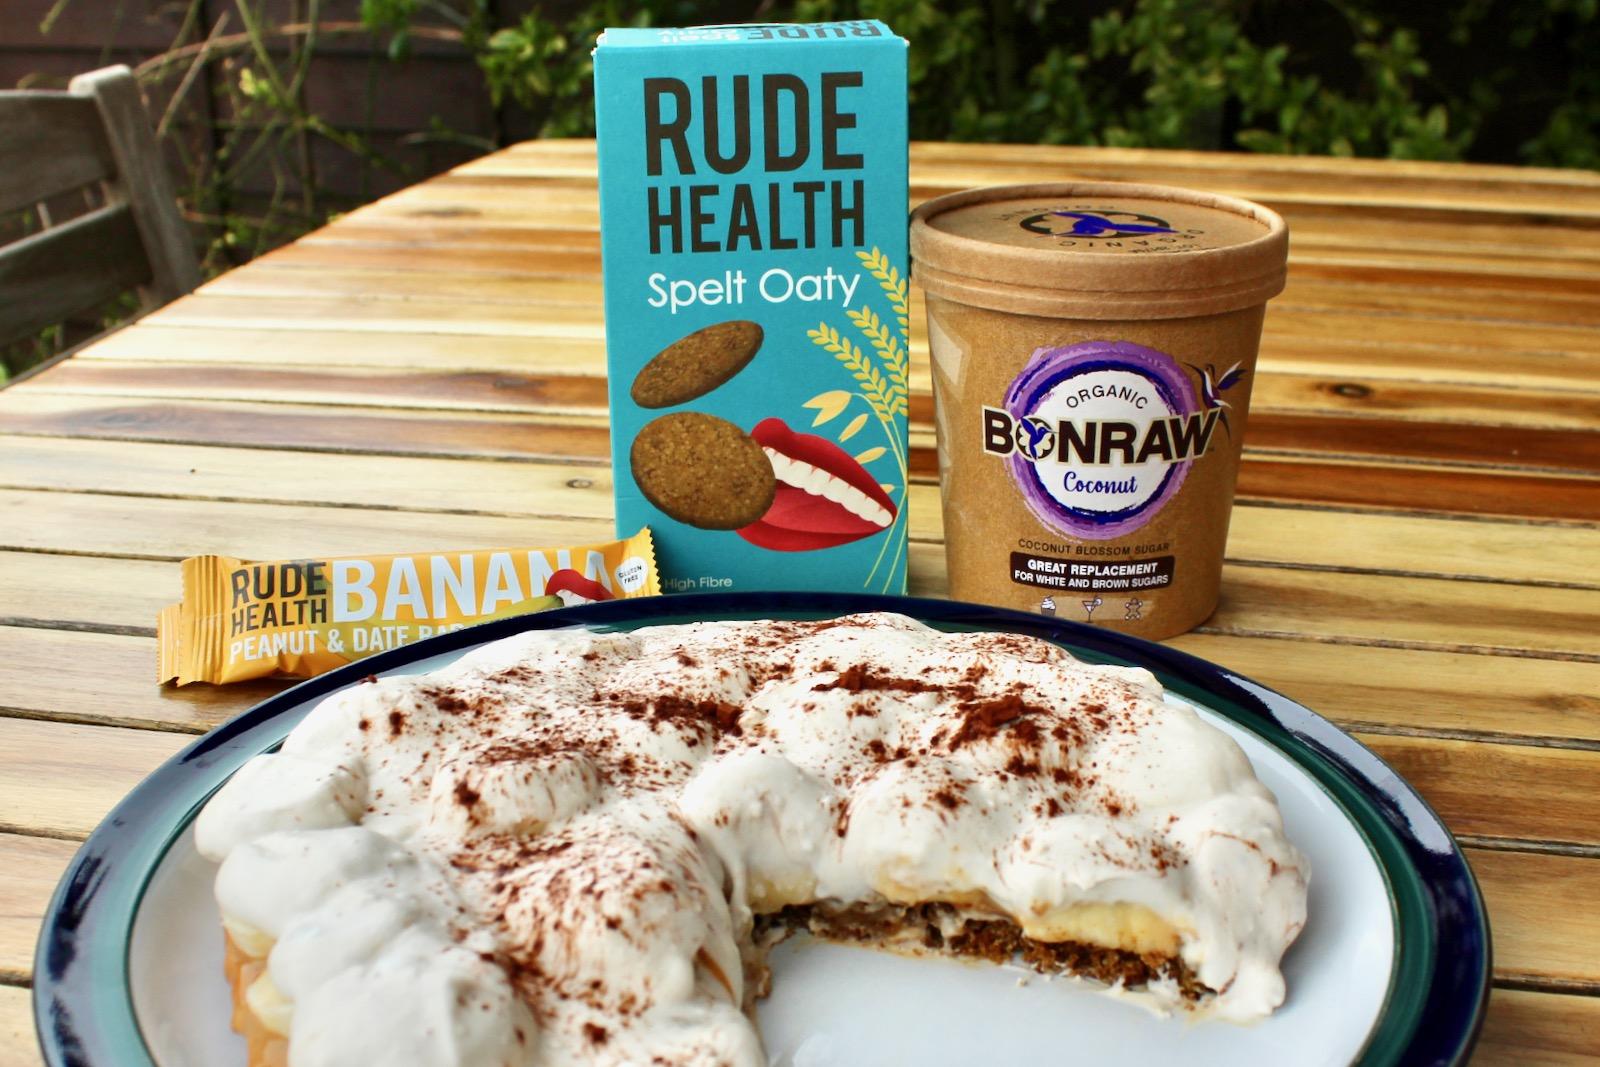 The Rude Alternative Banoffee Pie